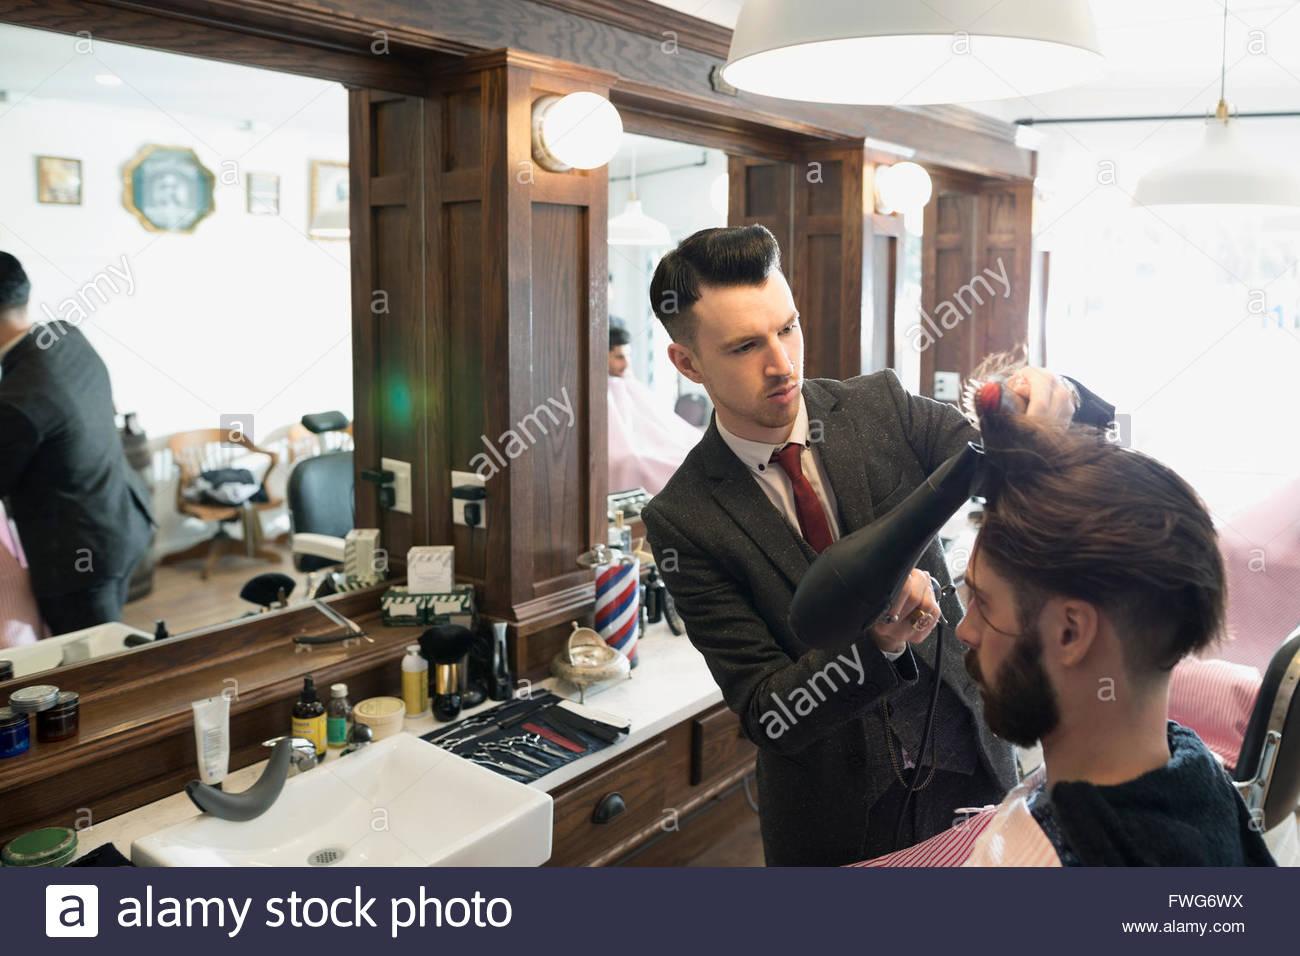 Barber blow drying man - Stock Image